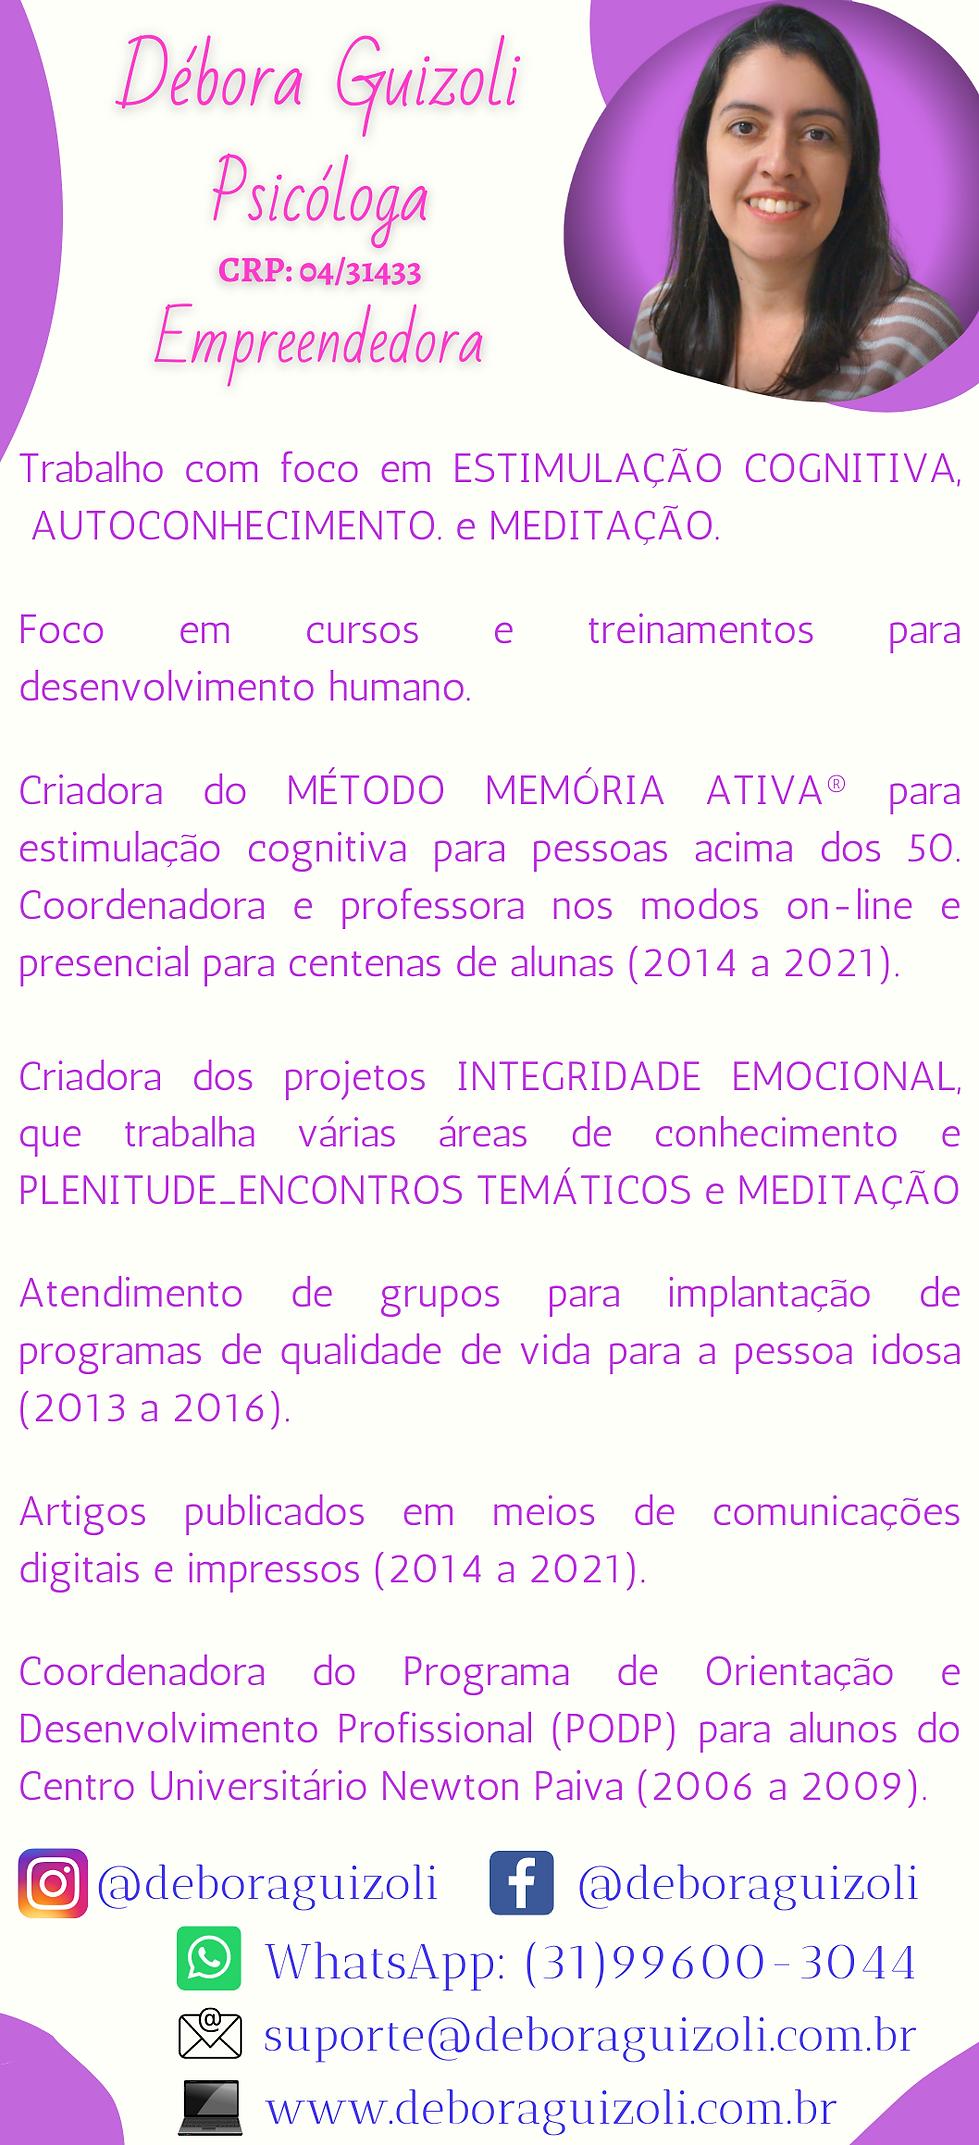 Currículo Débora 22-02-20213.png